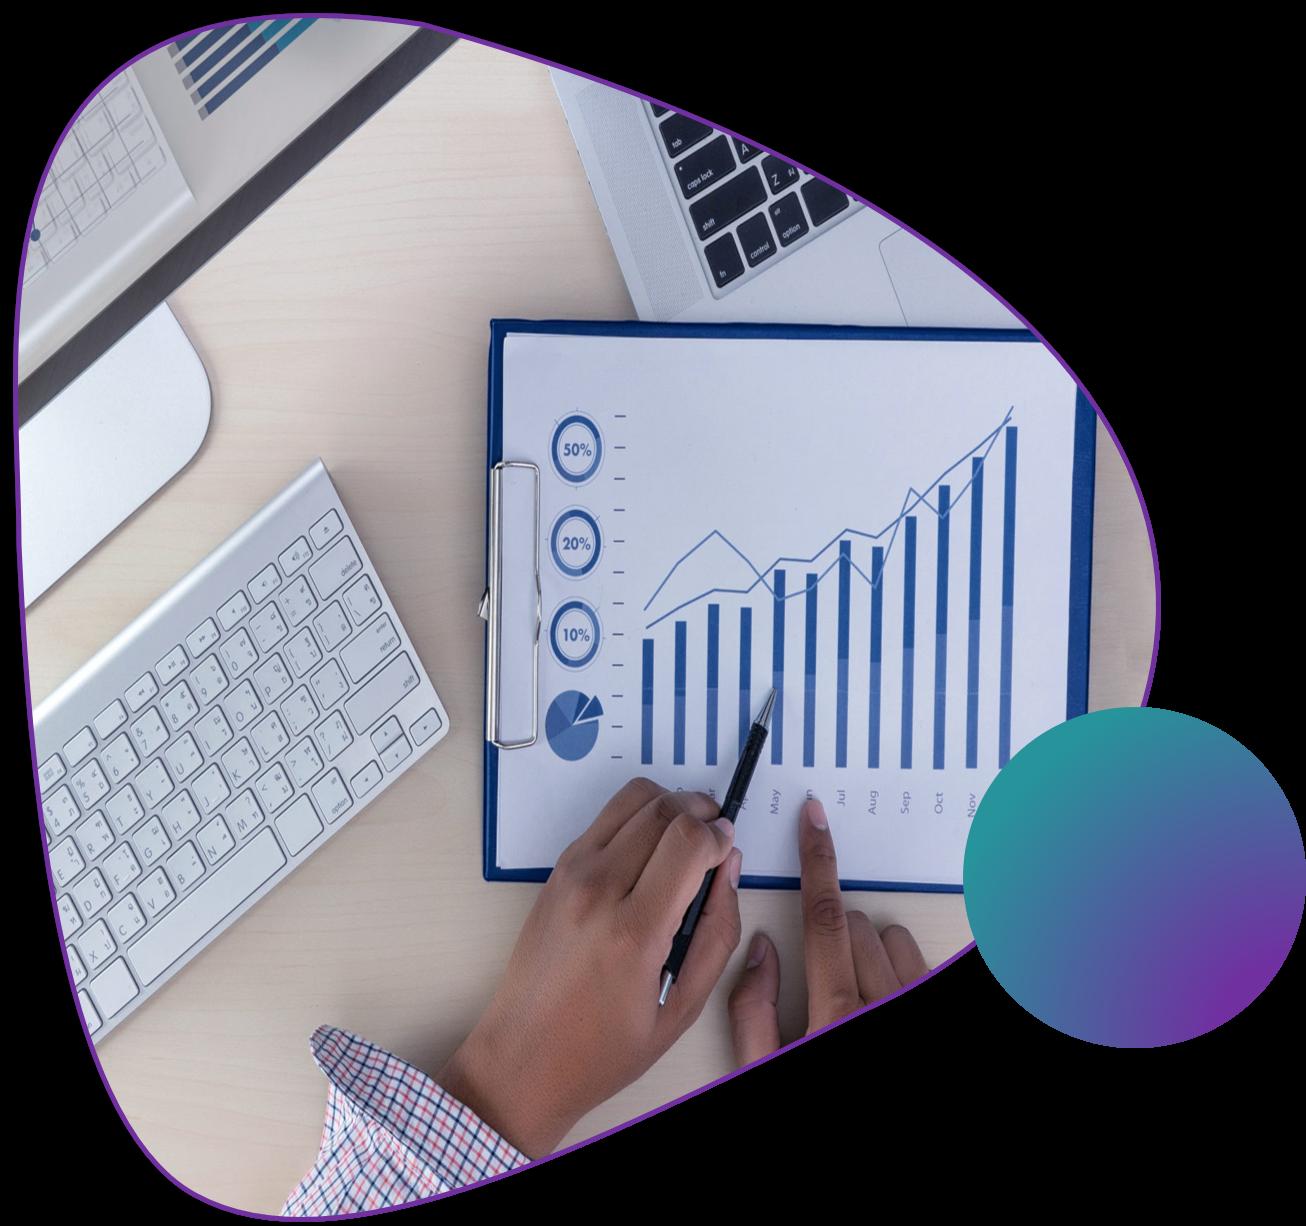 https://cotysoft.softmanagement.com.co/wp-content/uploads/2020/08/Analitica-de-Datos.png